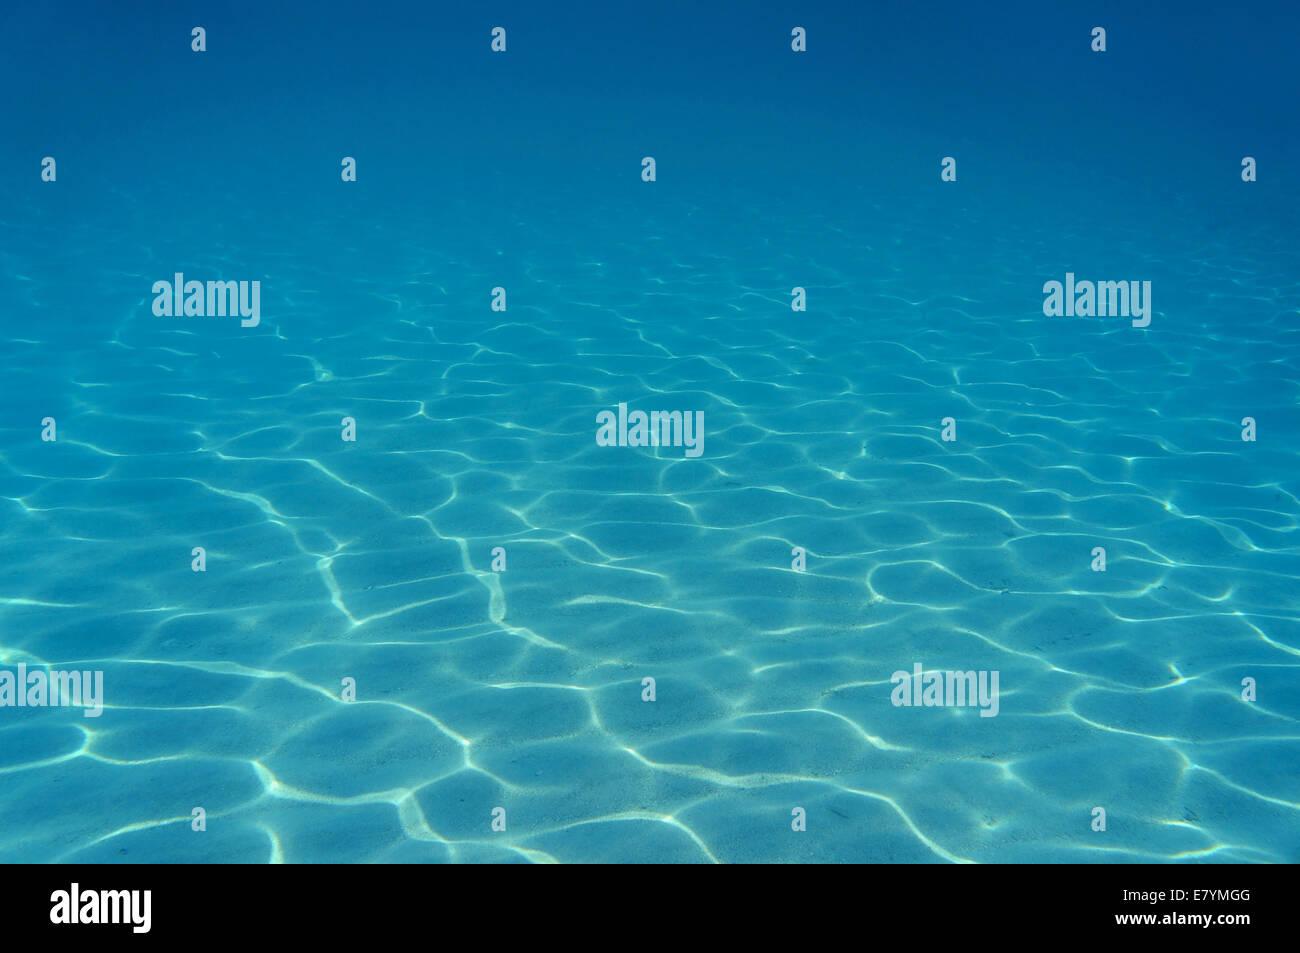 Ondas de luz submarina en fondos arenosos en el mar Caribe Imagen De Stock